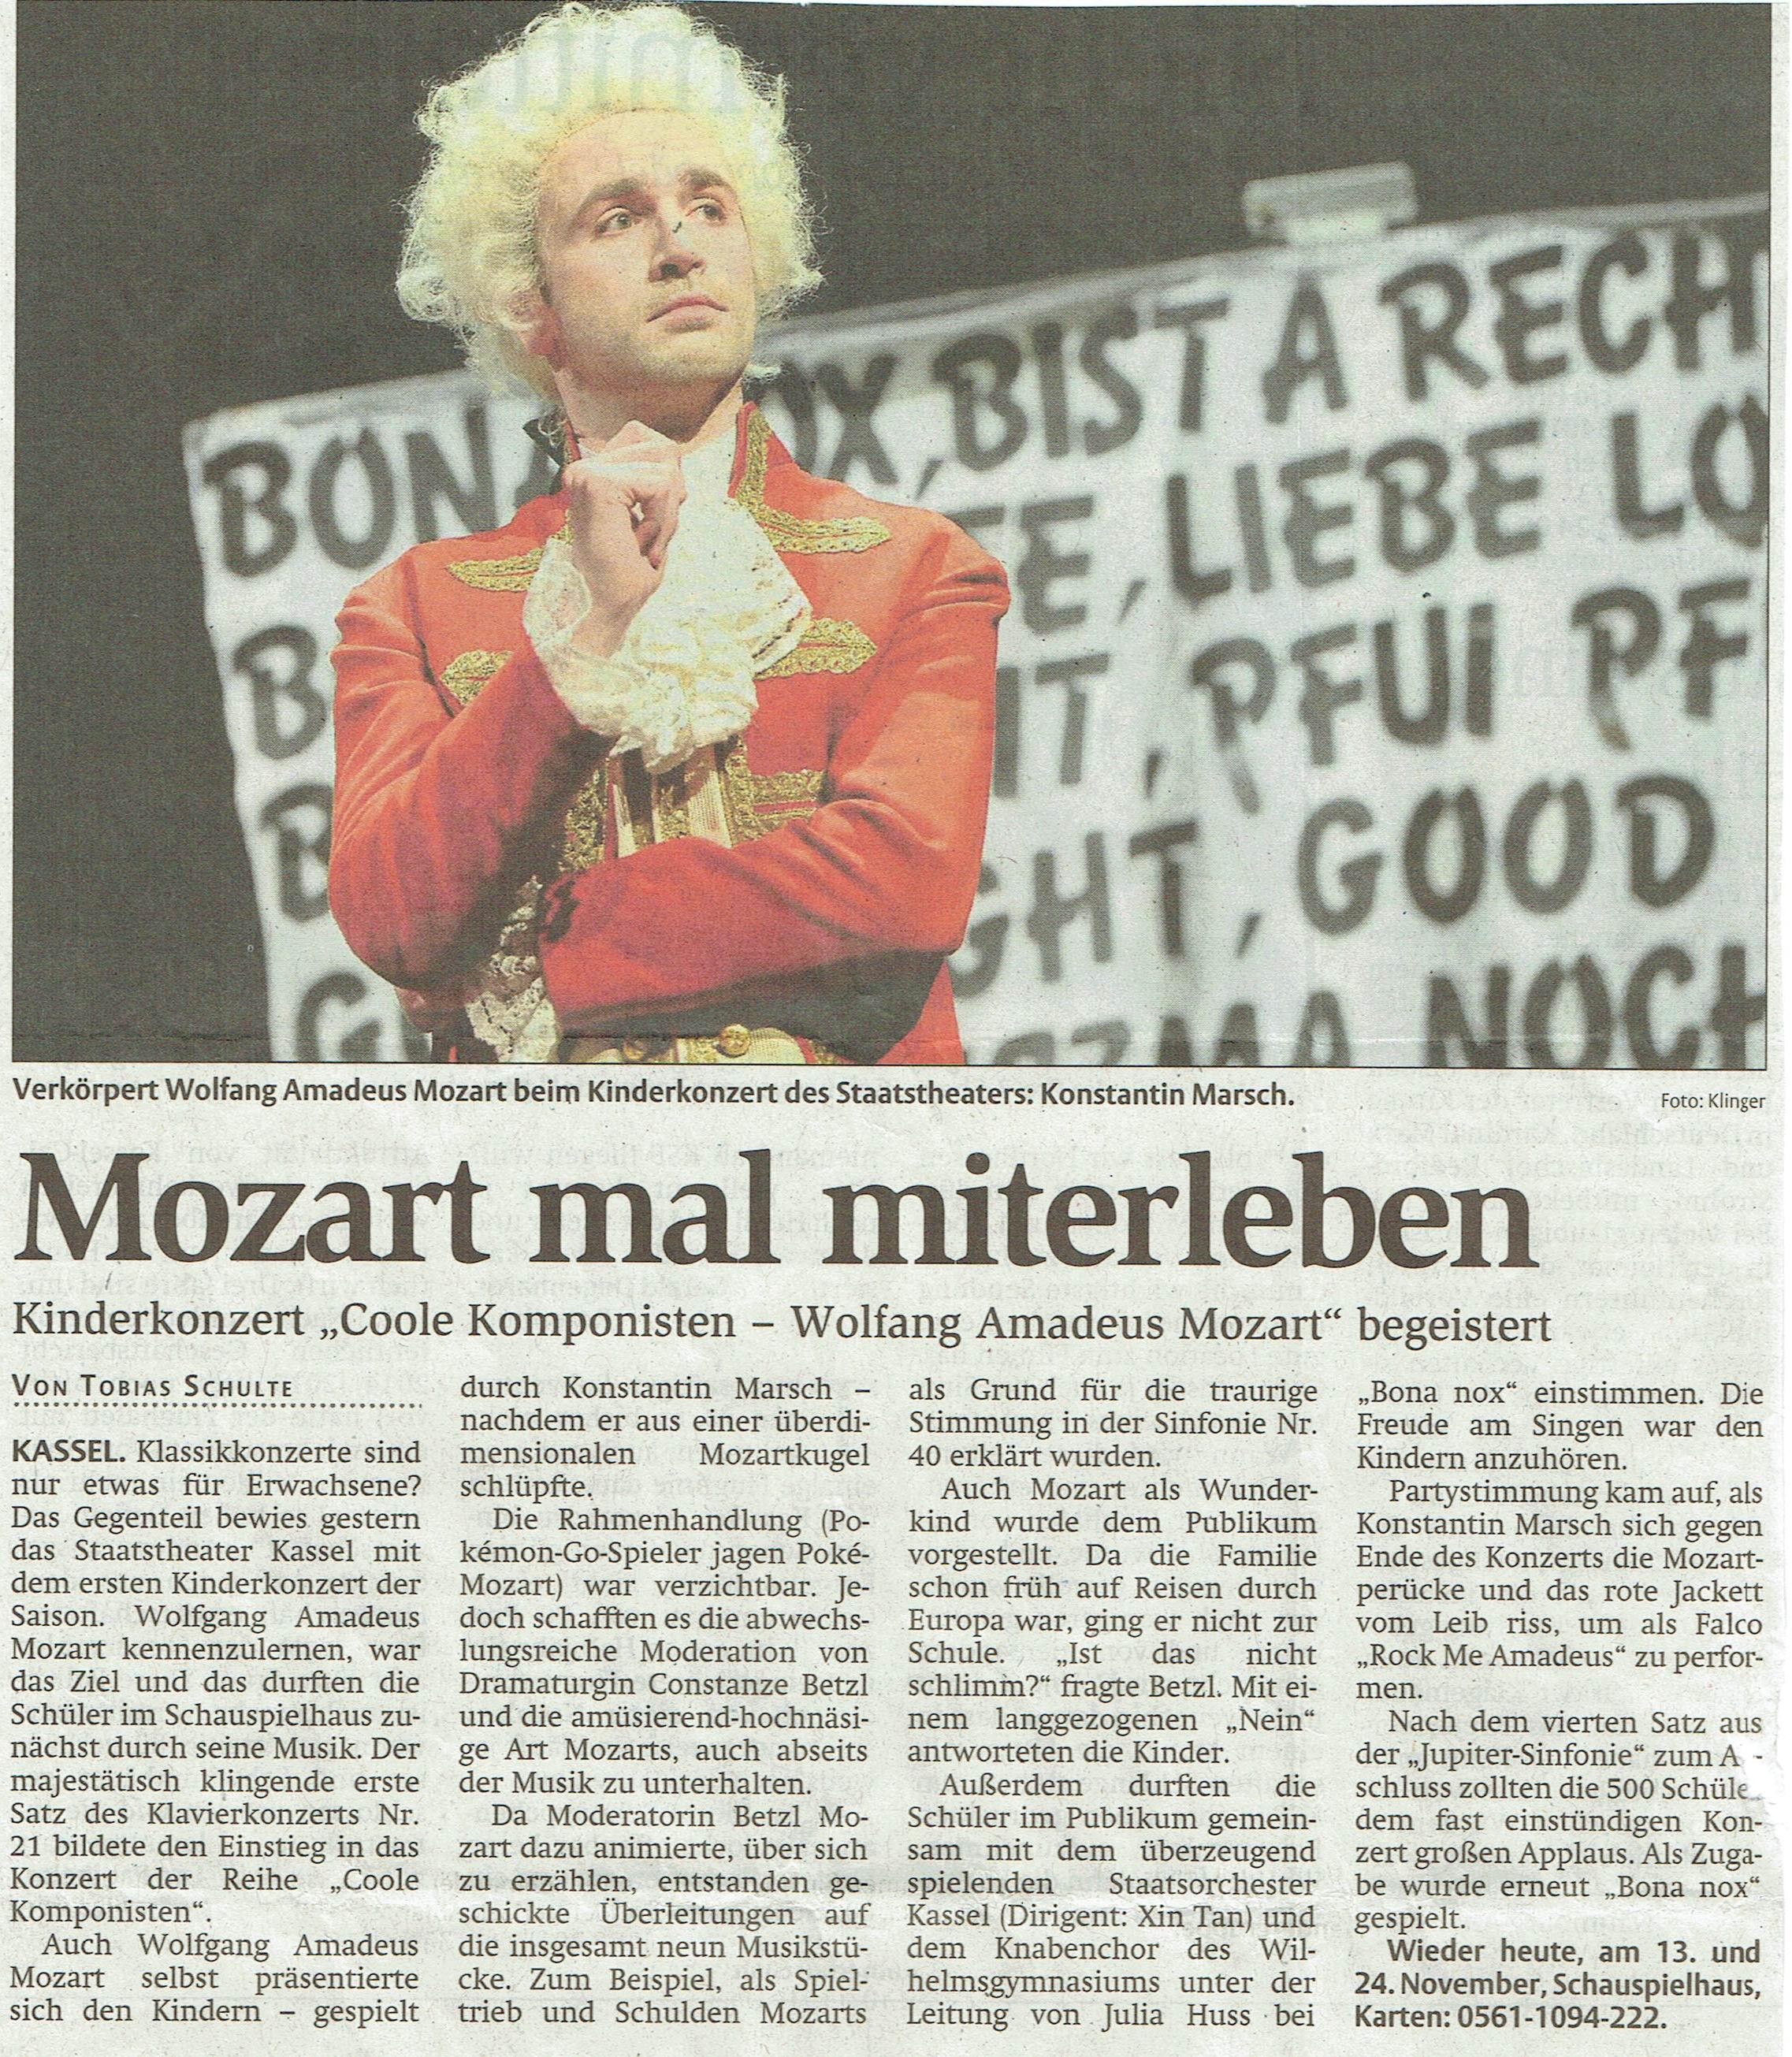 mozart cool Komponisten Kassel 1